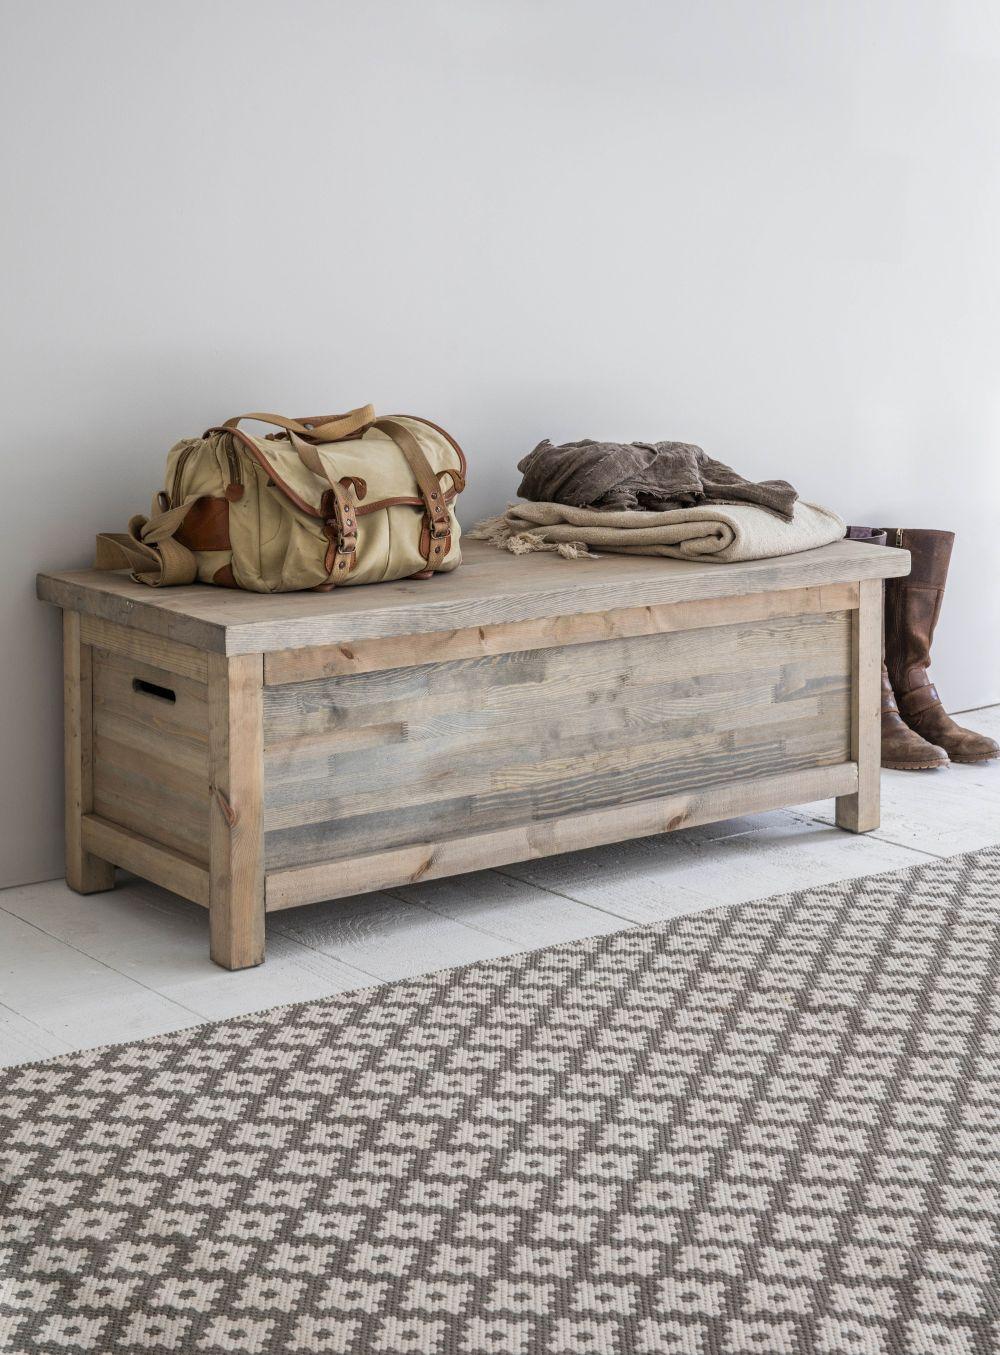 8garden-trading-aldsworth-hallway-bench-box-spruce.jpg